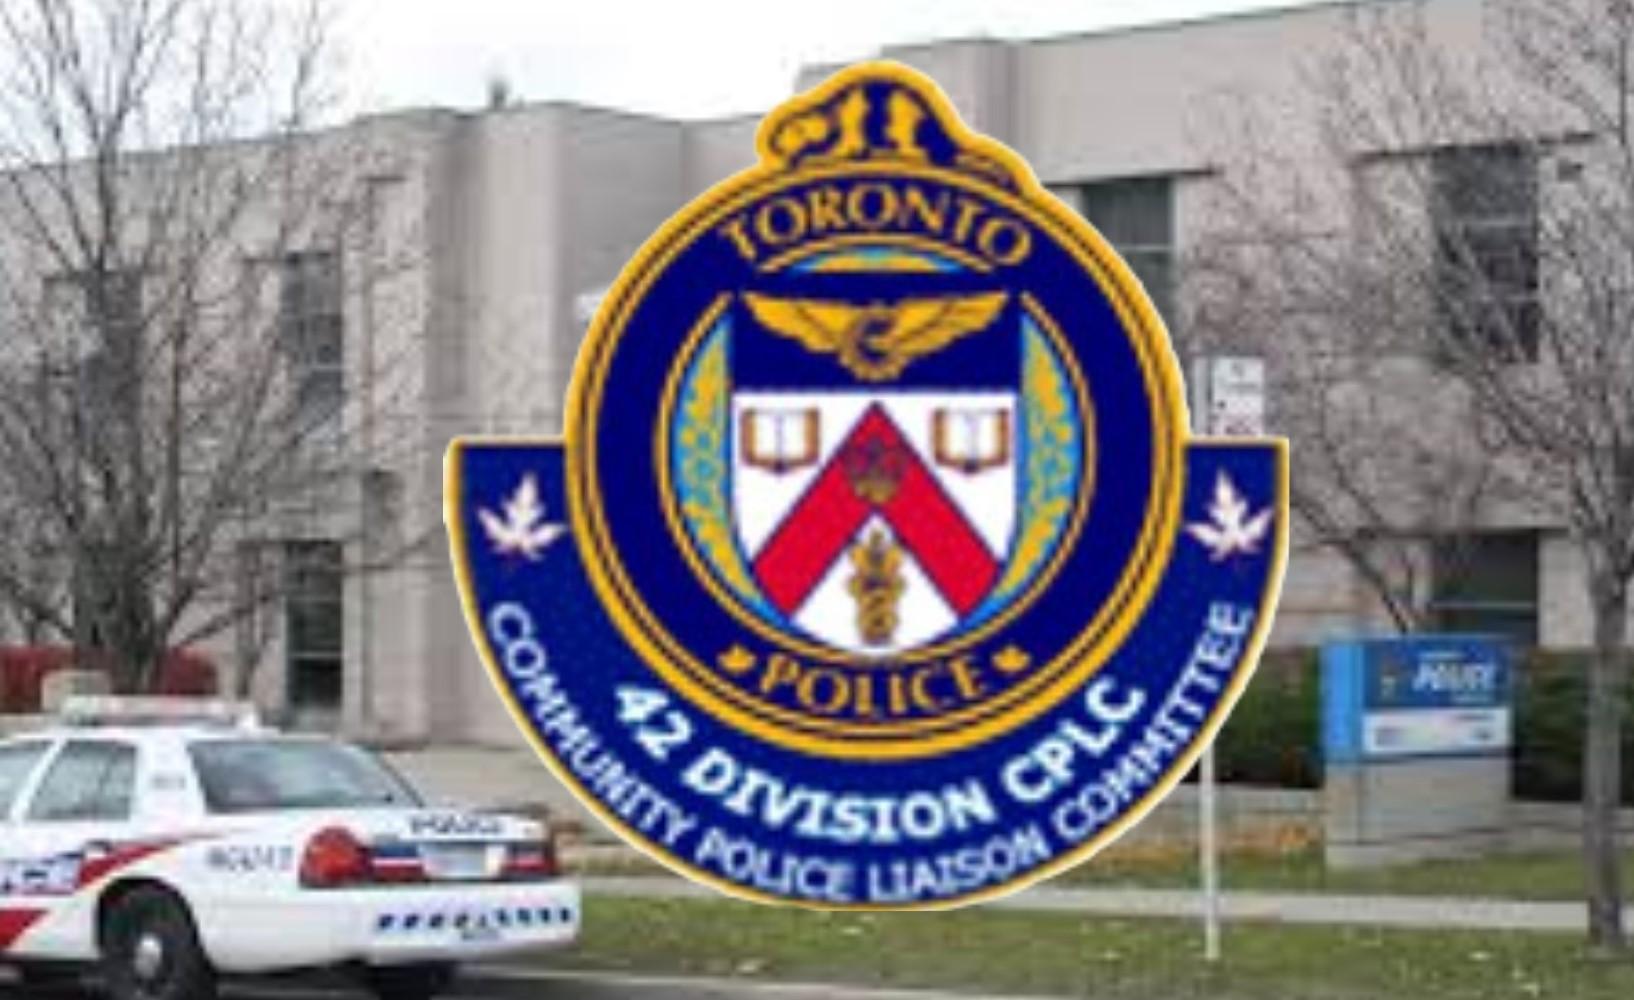 42 Division Community Police Liaison Comitee